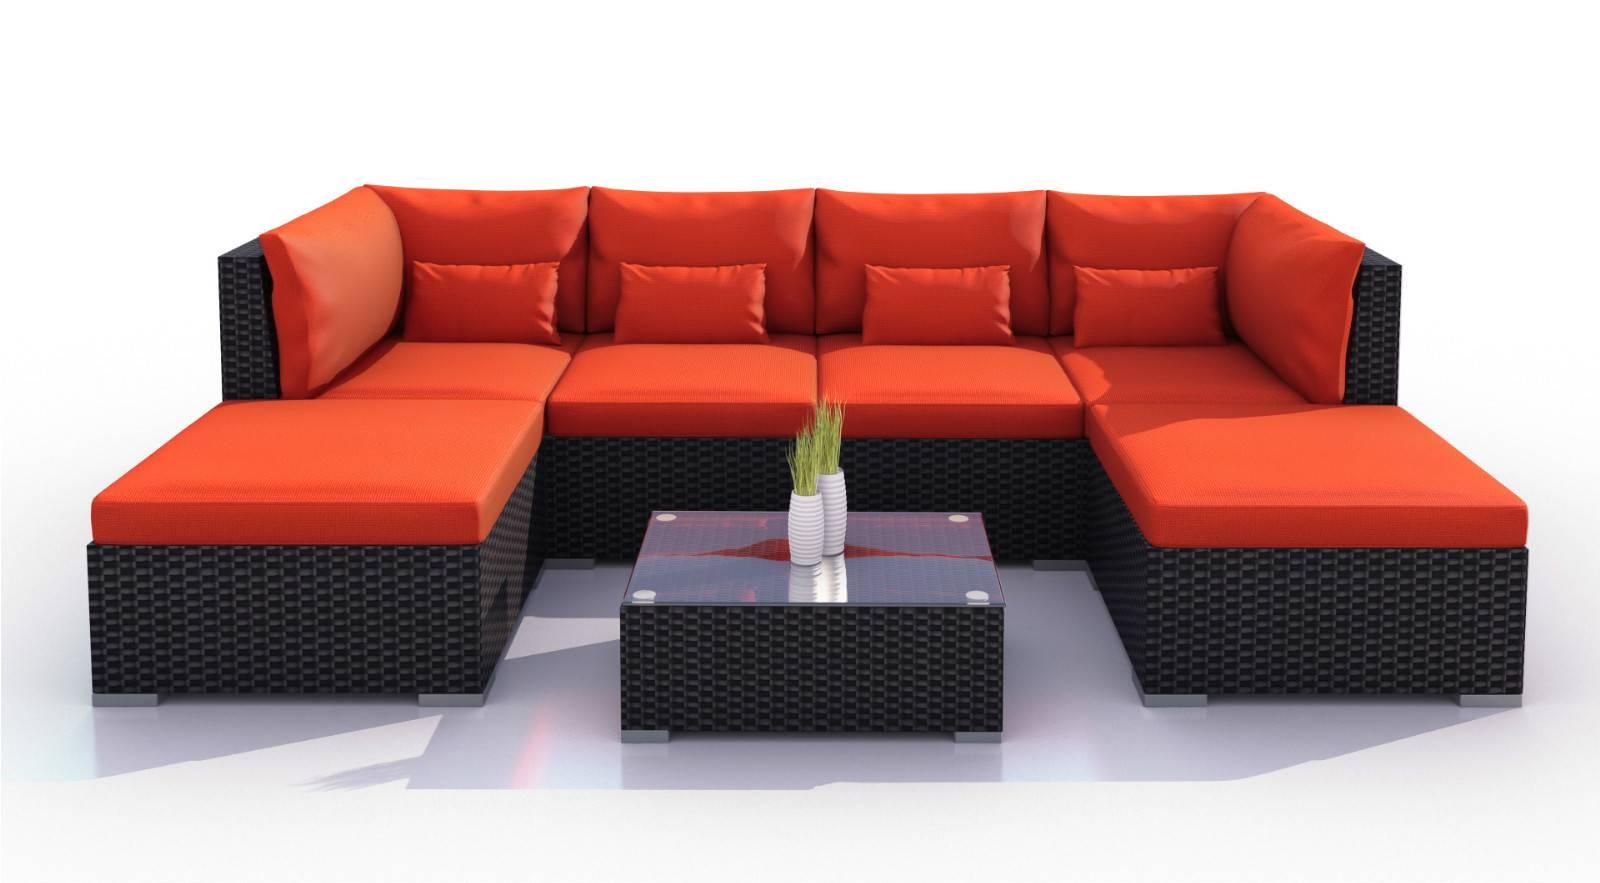 2013 good quality rattan outdoor furniture Fashion Rattan sofa Set Furniture